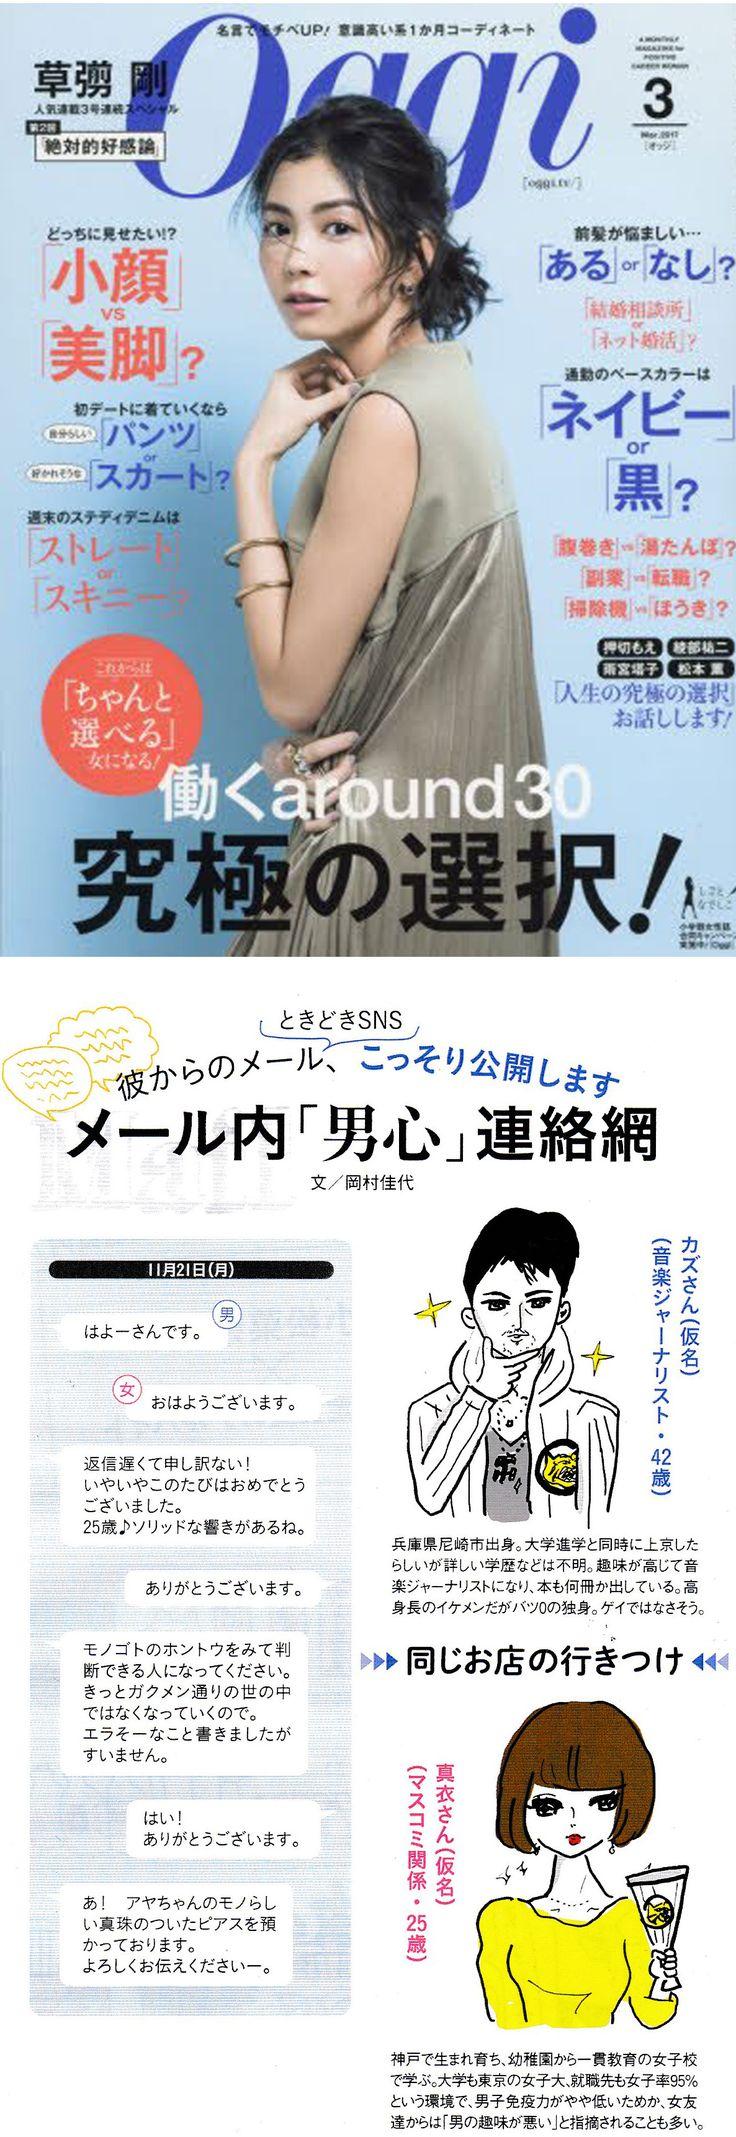 Oggi 2017 March illustration: akiko hiramatsu